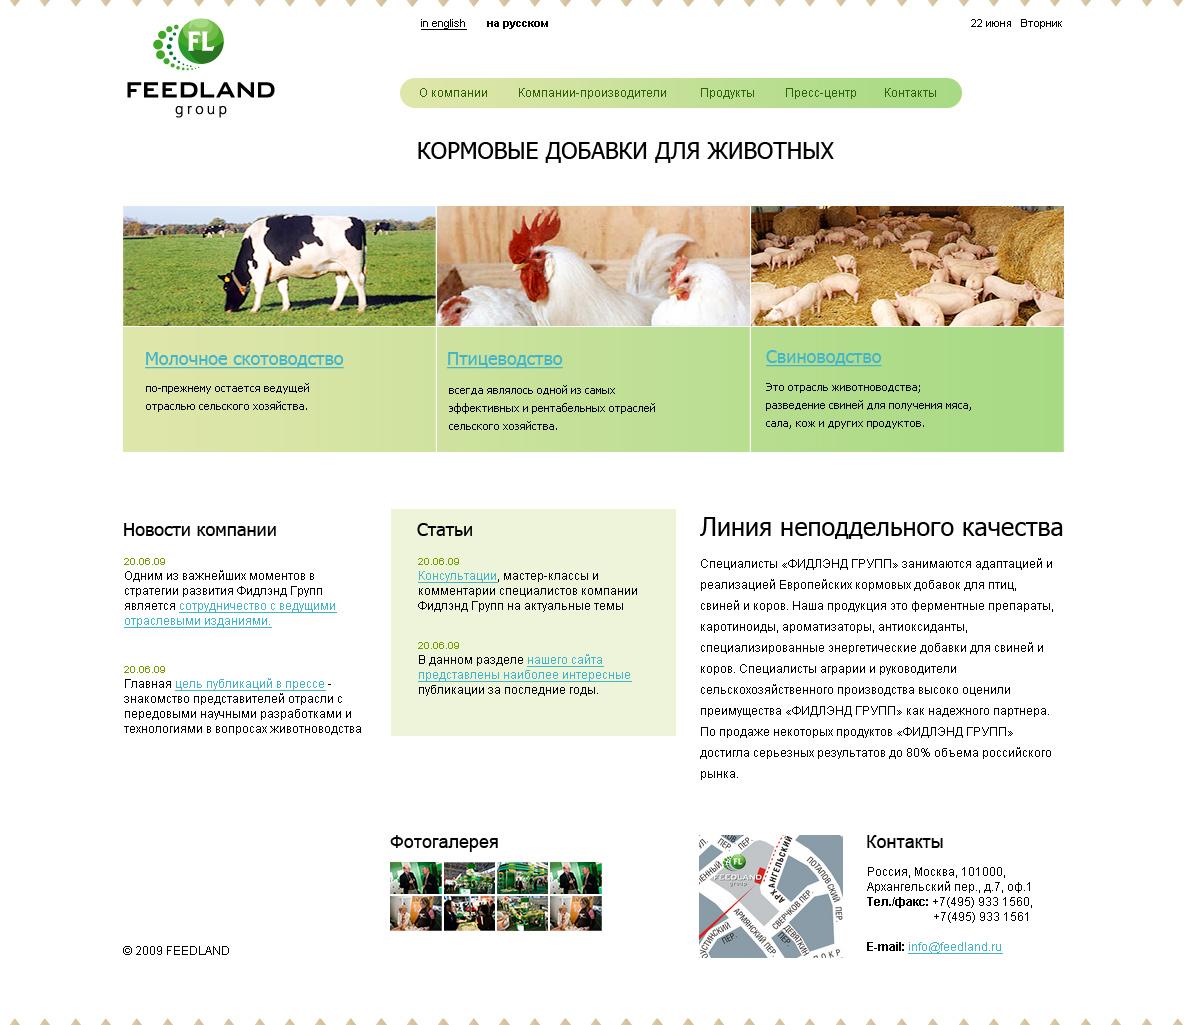 Дизайн сайта Feedland